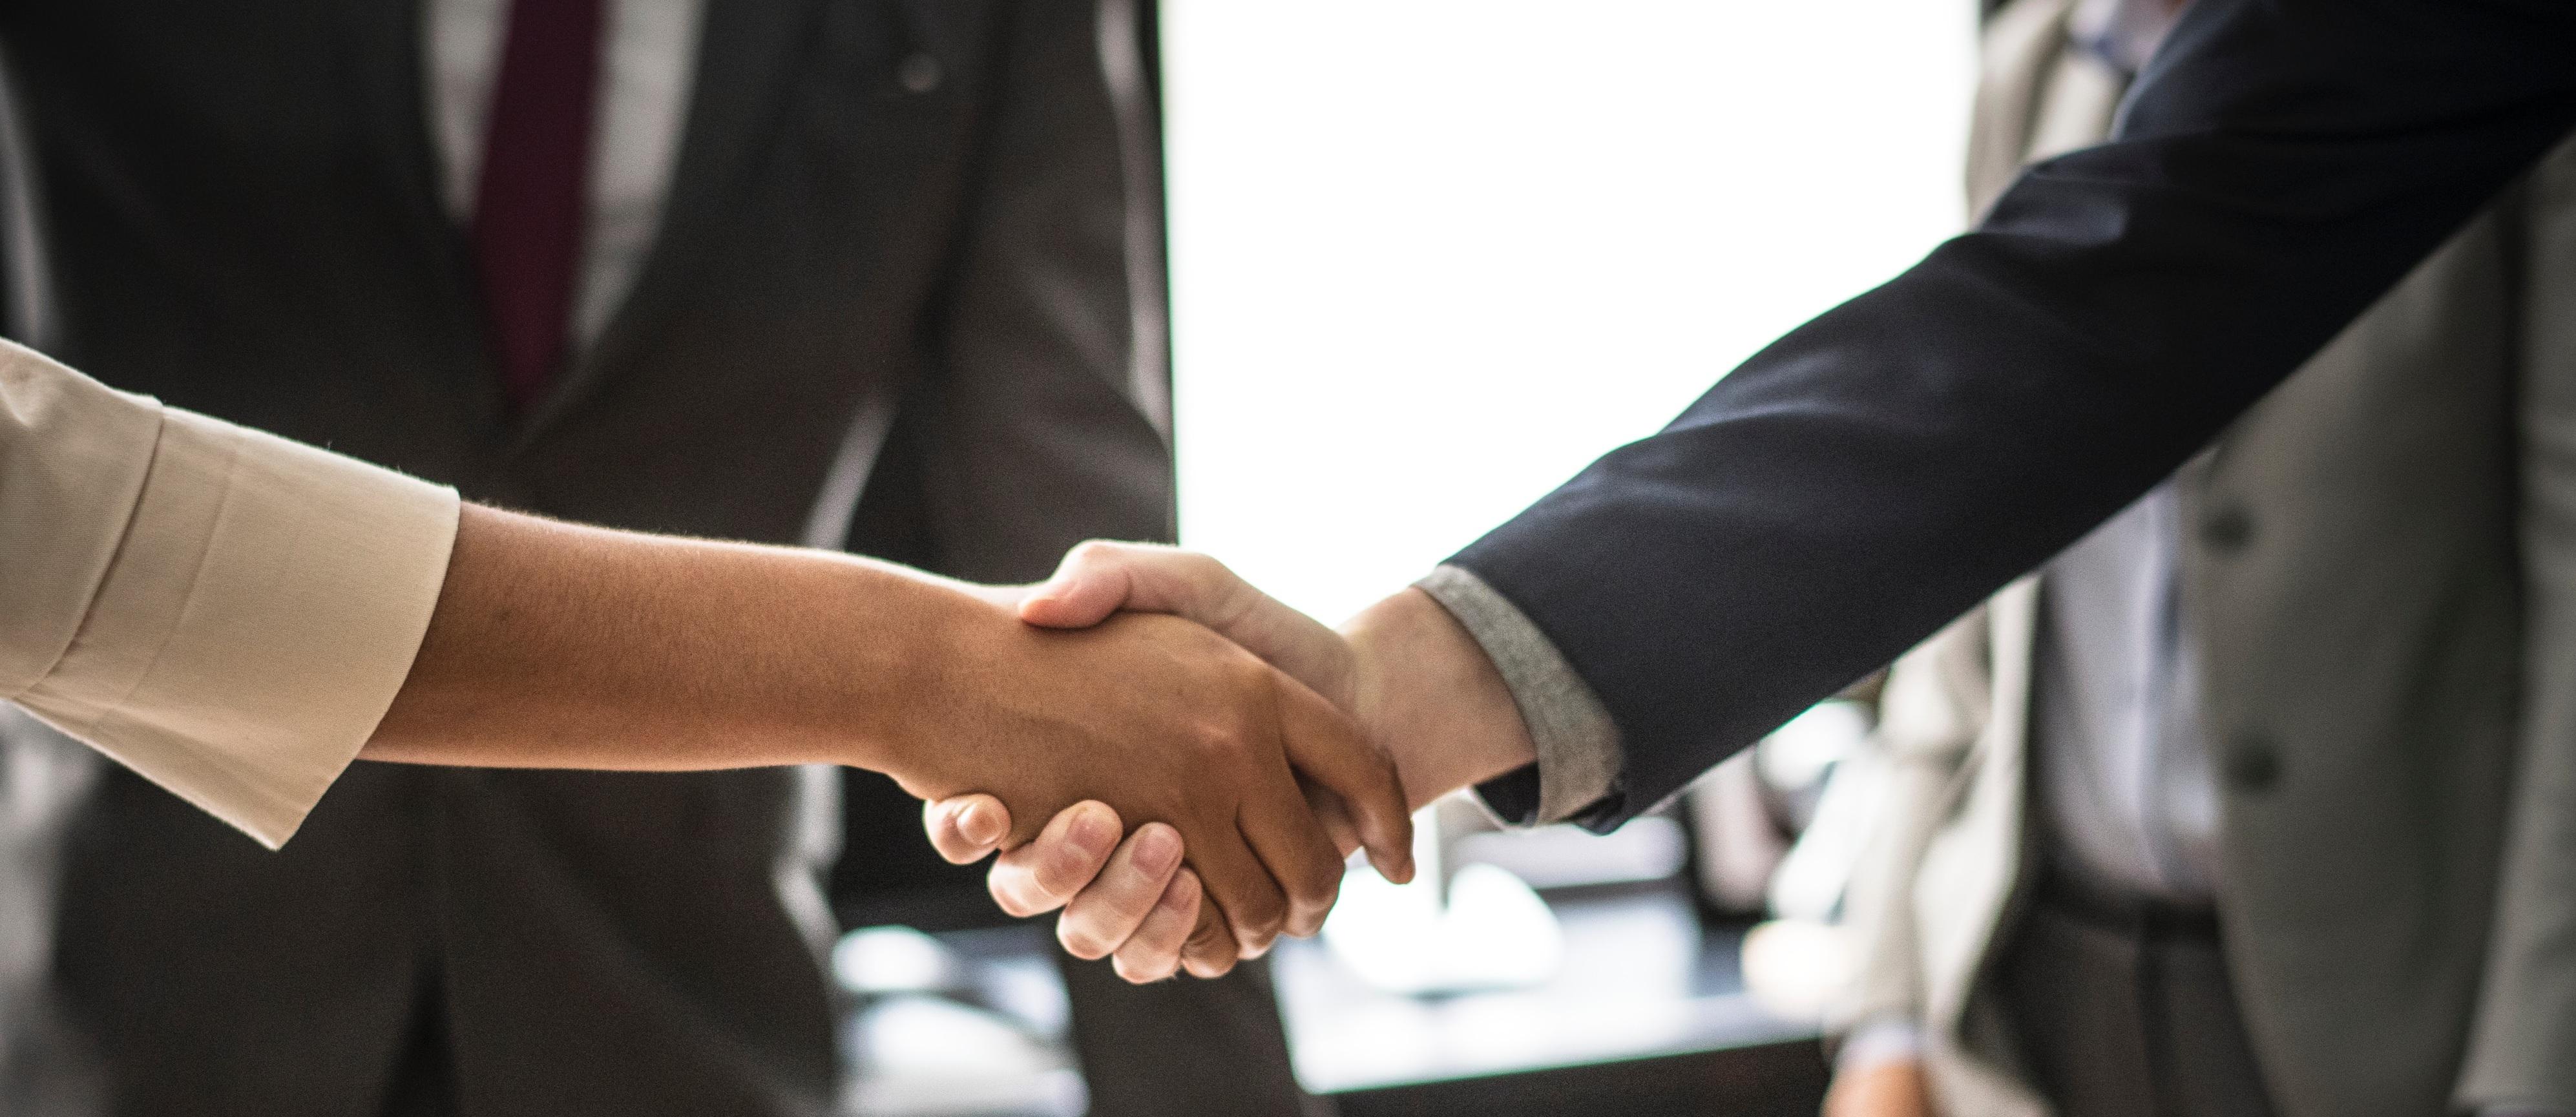 Handshake/Promise